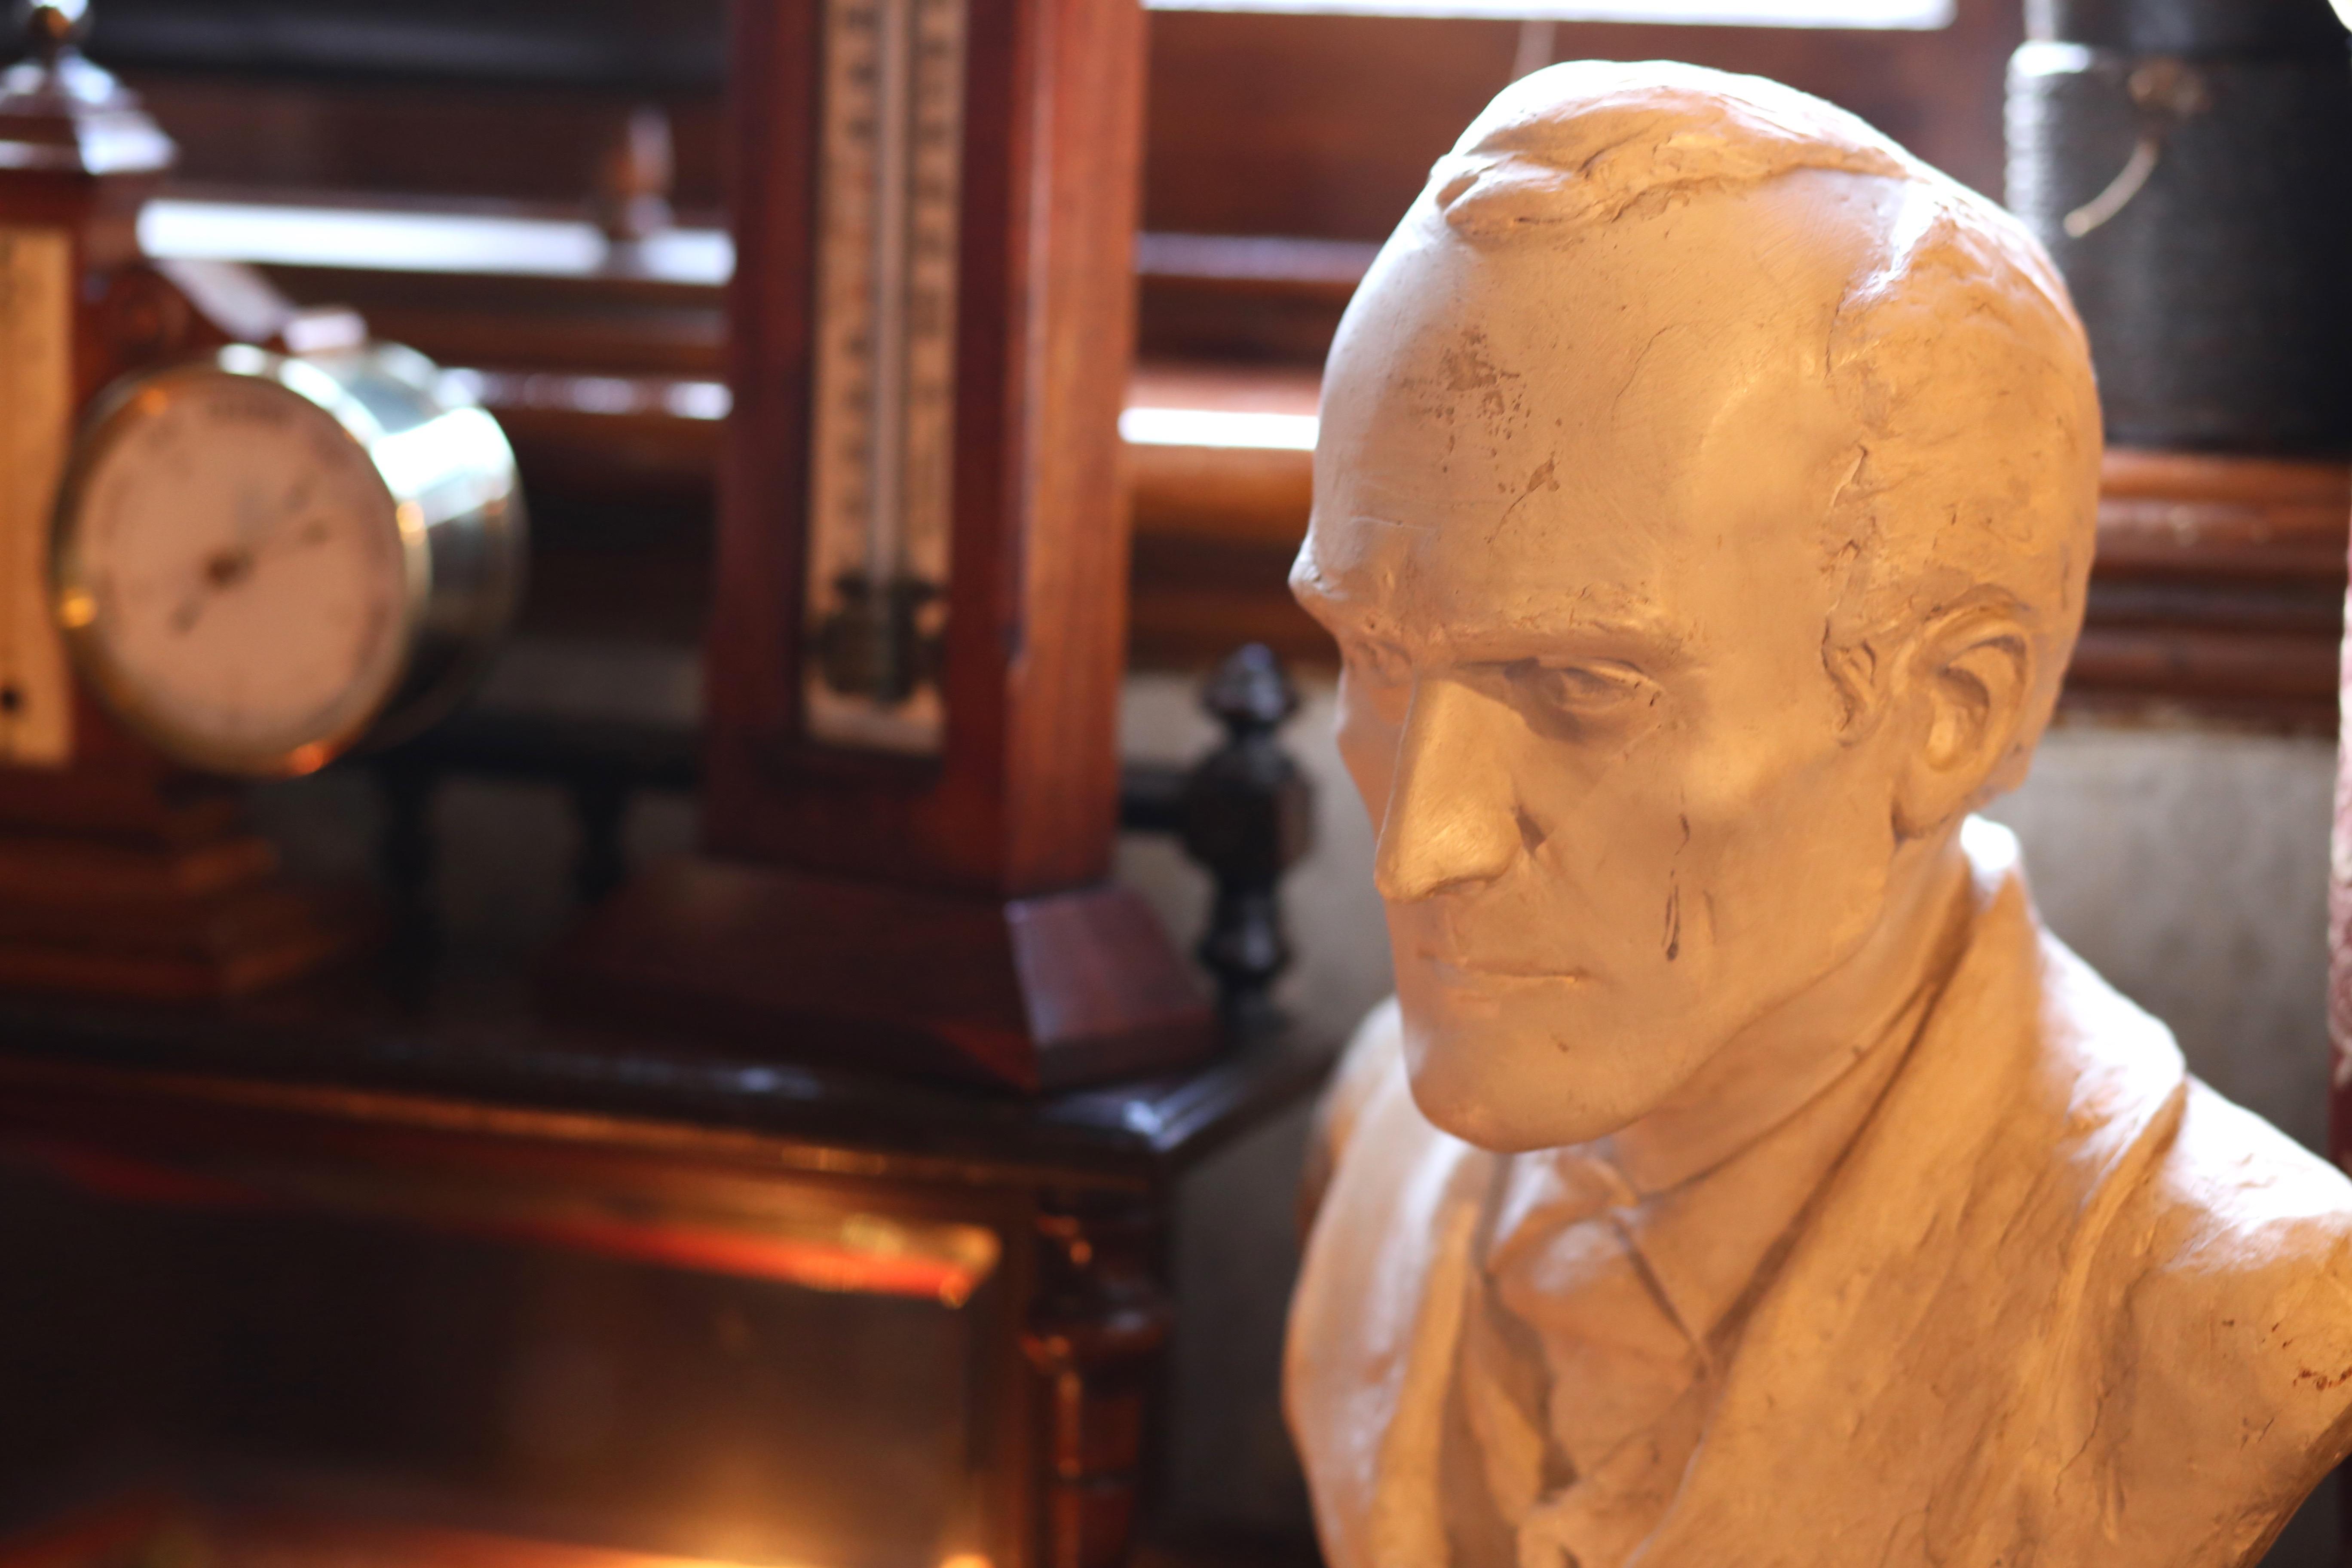 london sherlock holmes museum rhyme ribbons sherlock bust sherlock holmes